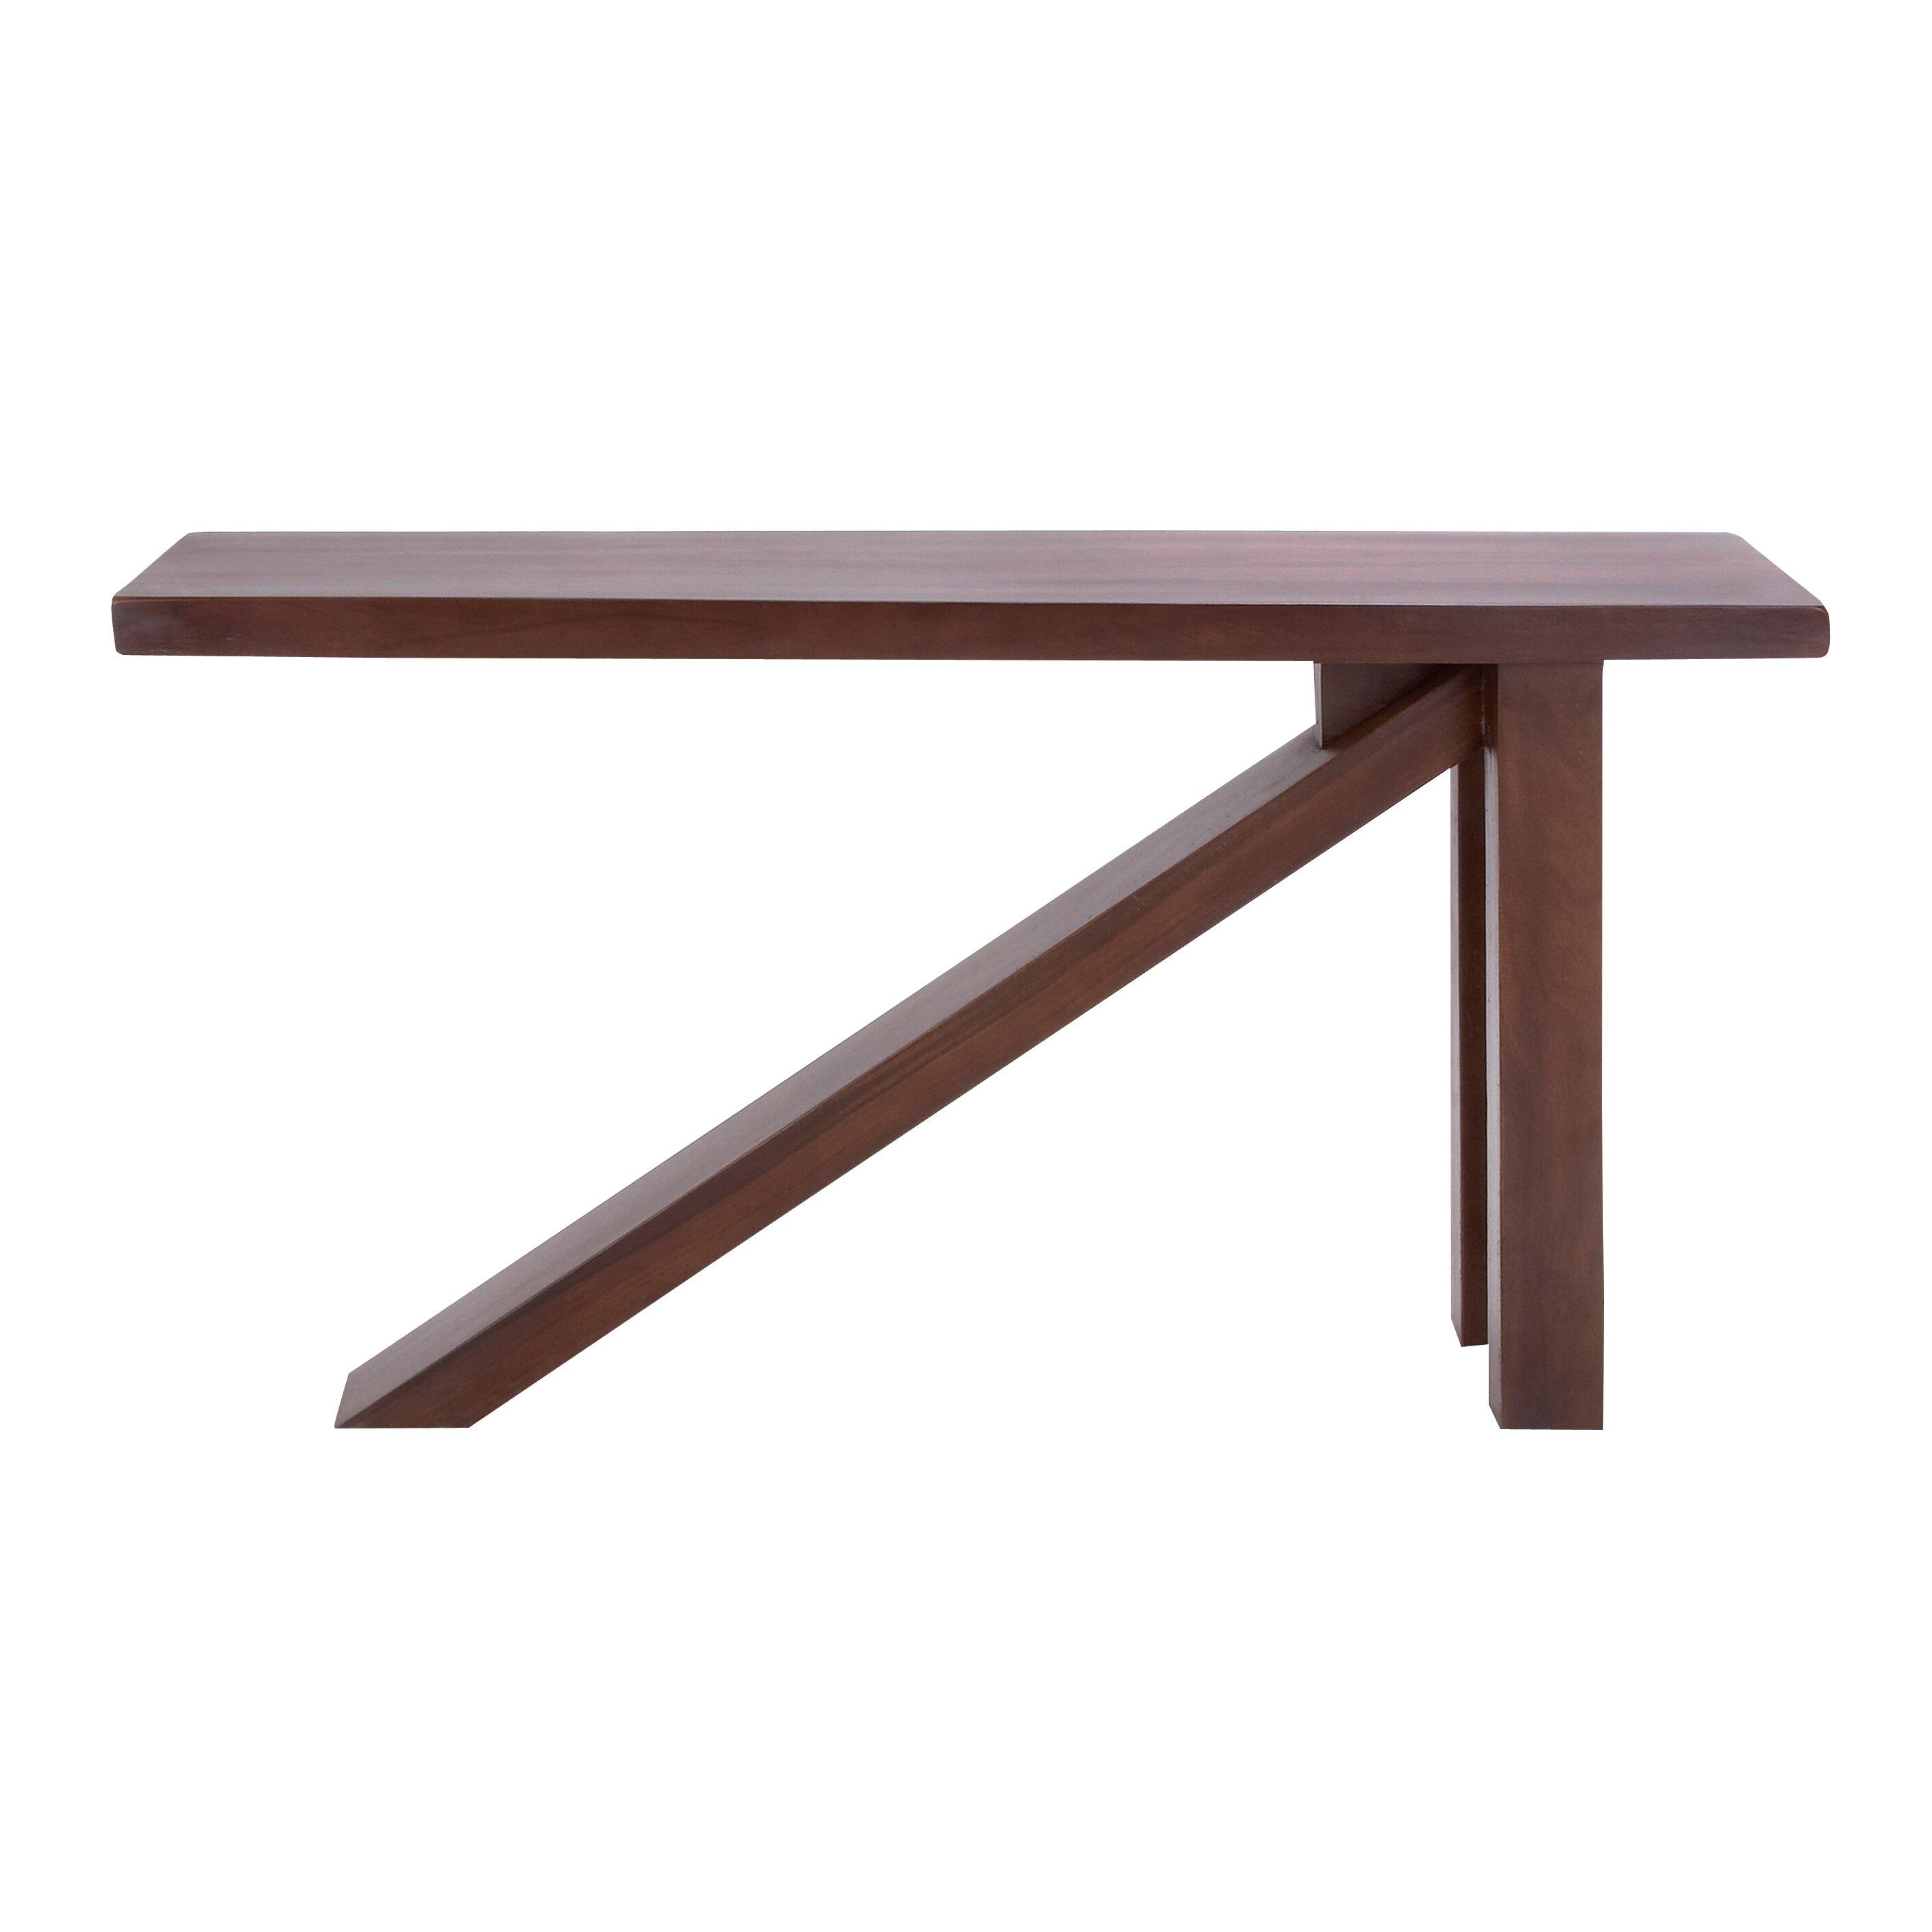 Woodland Imports Console Table ... ... Brown Console & Sofa Tables Woodland Imports SKU: WLI6983